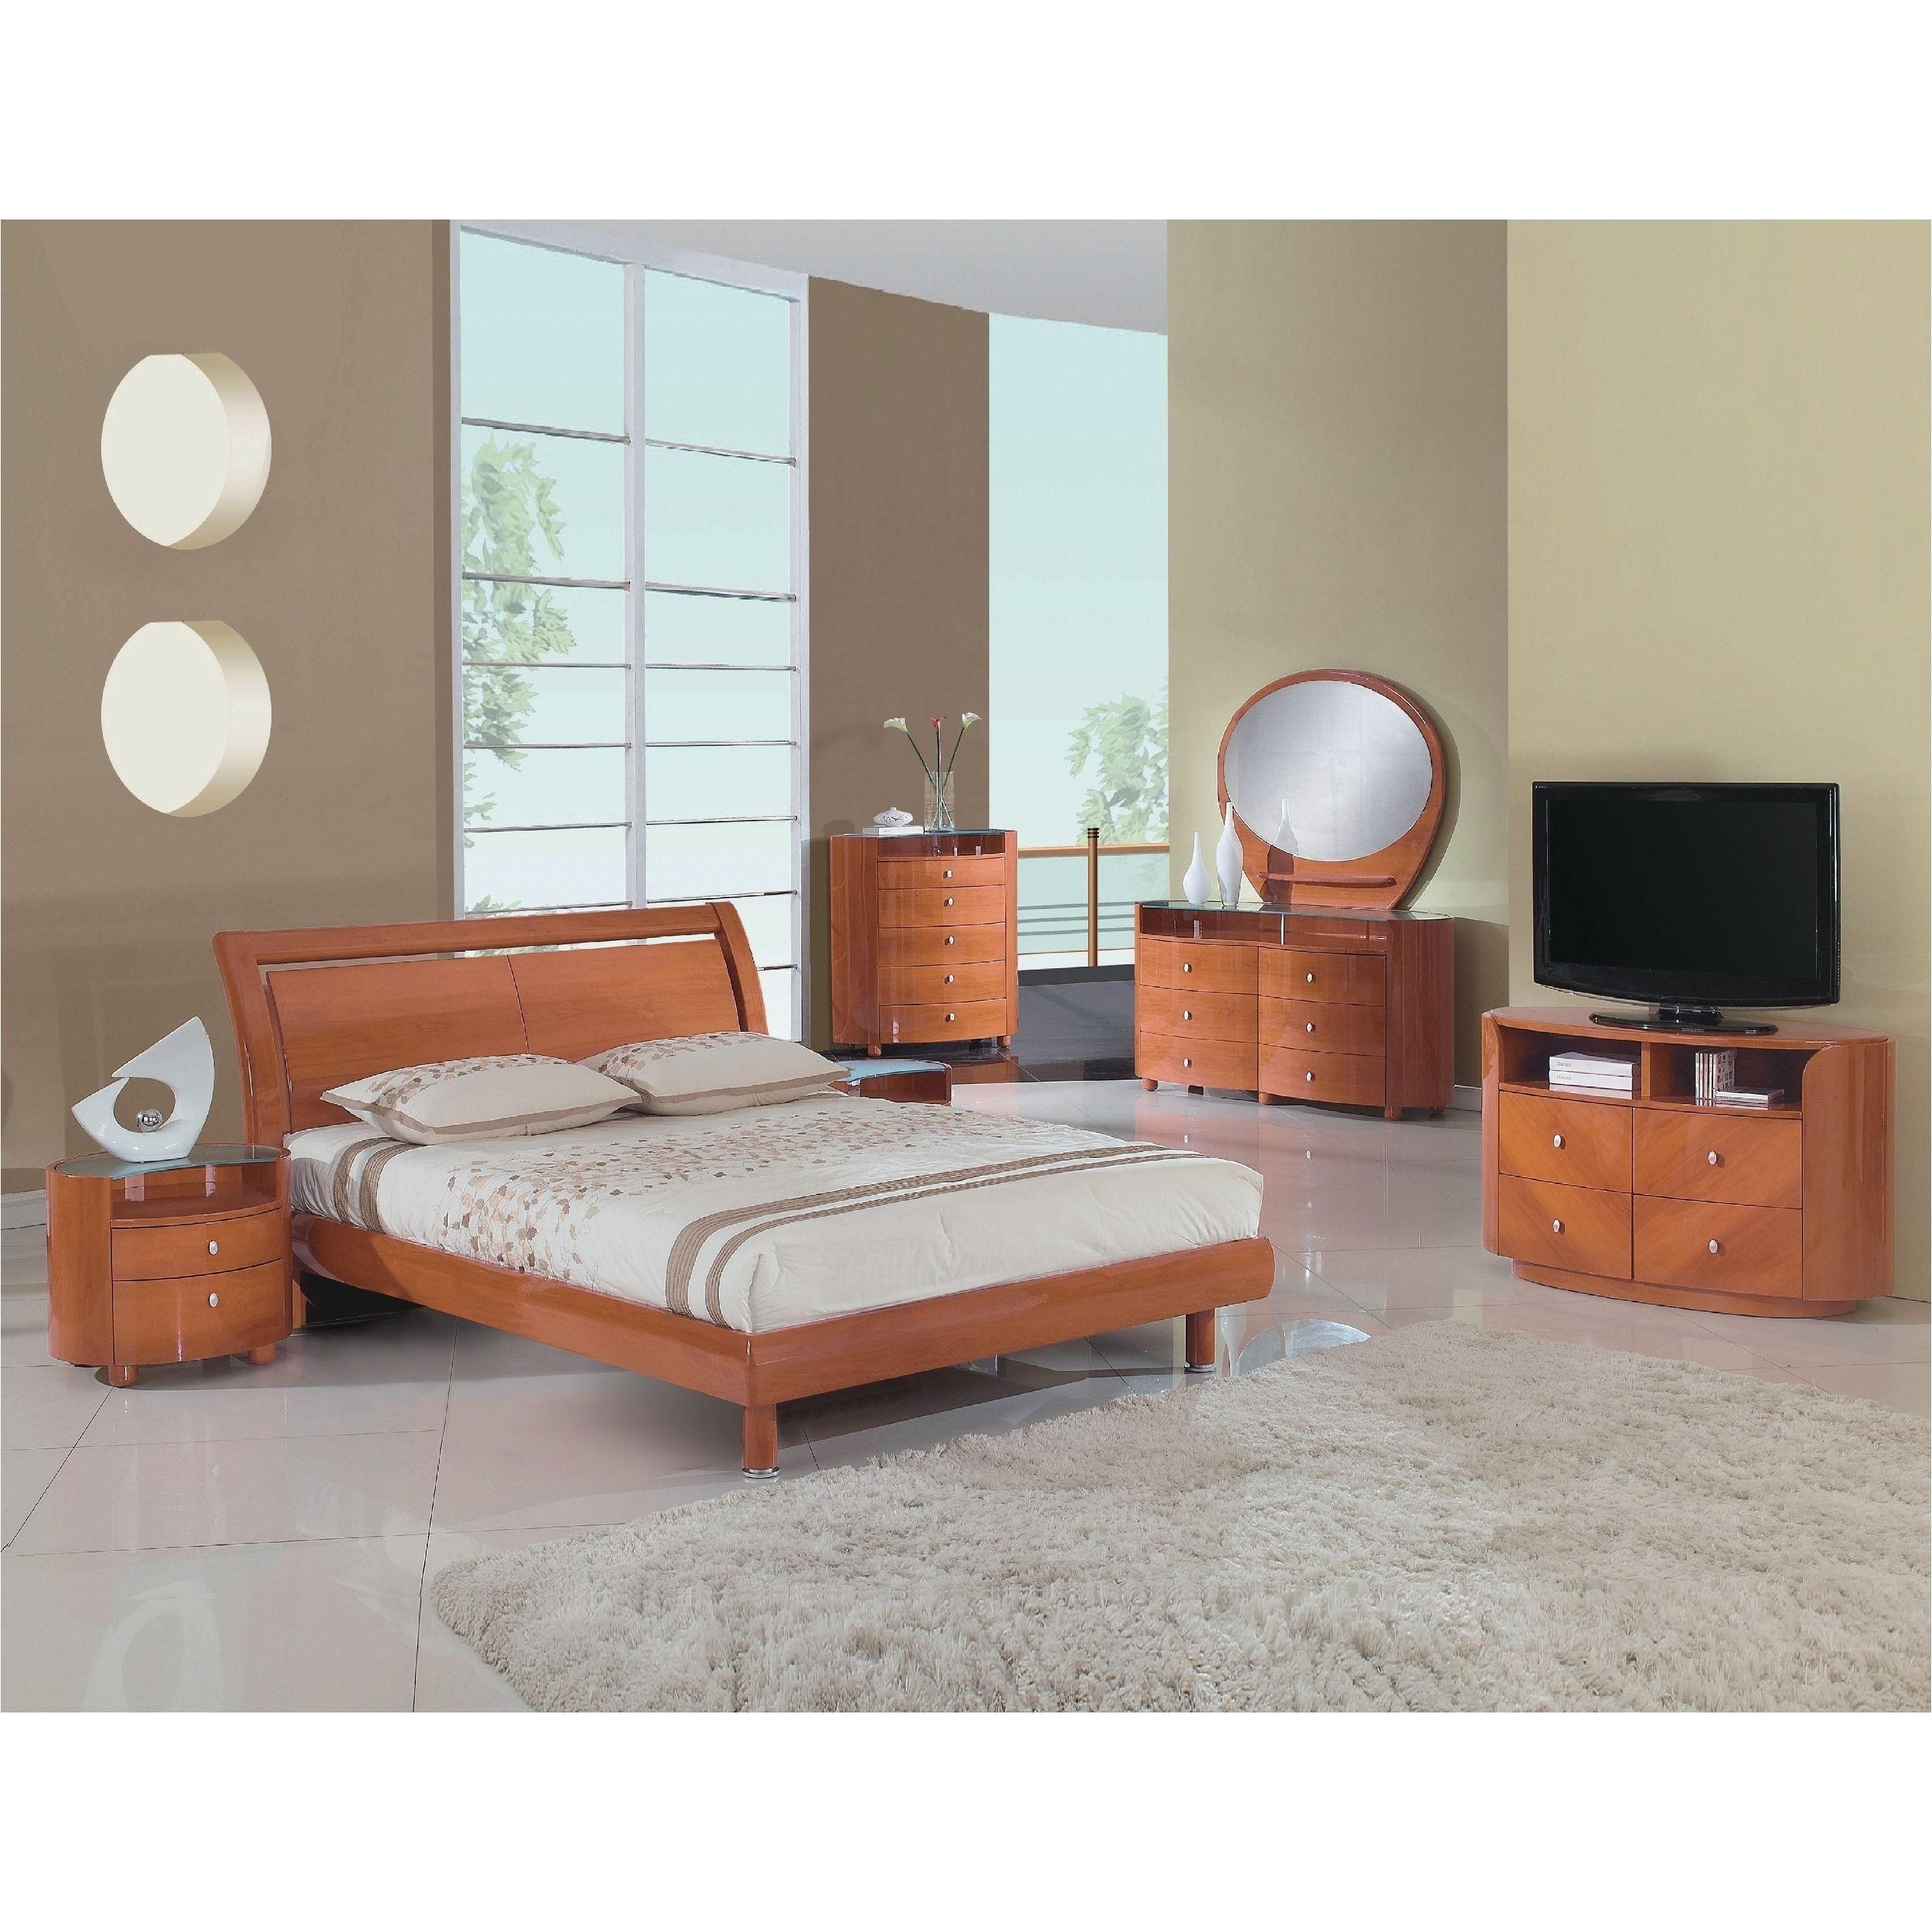 Price King Size Bed Fresh King Bedroom Set Beautiful Brown Bedroom Set Best Vcf Furniture